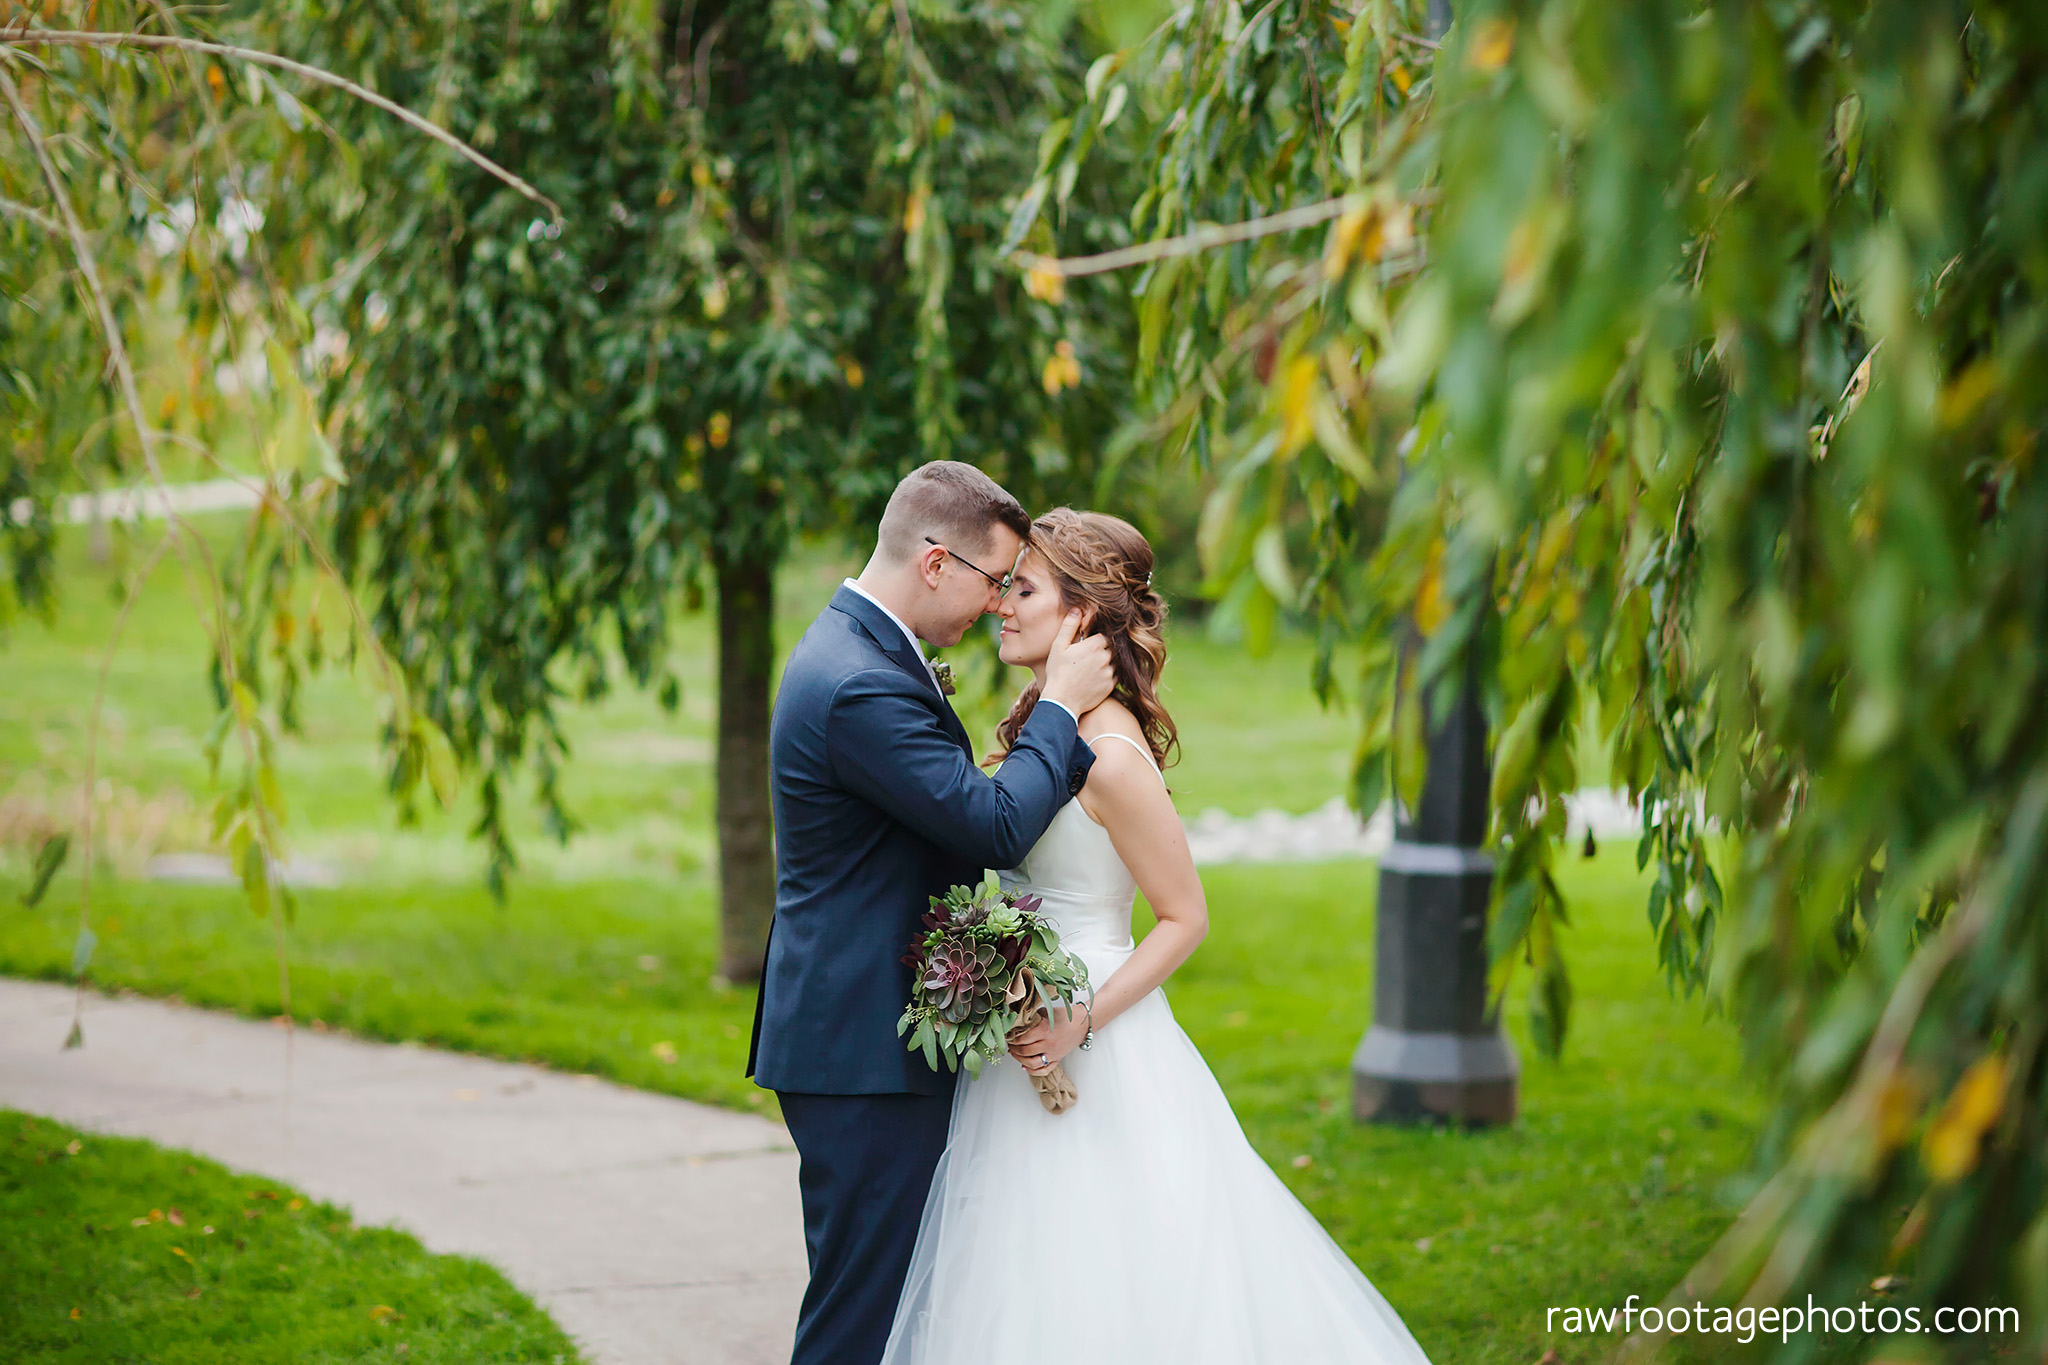 london_ontario_wedding_photographer-civic_gardens-springbank_park-succulent_bouquet-fall_wedding-bridge-raw_footage_photography056.jpg